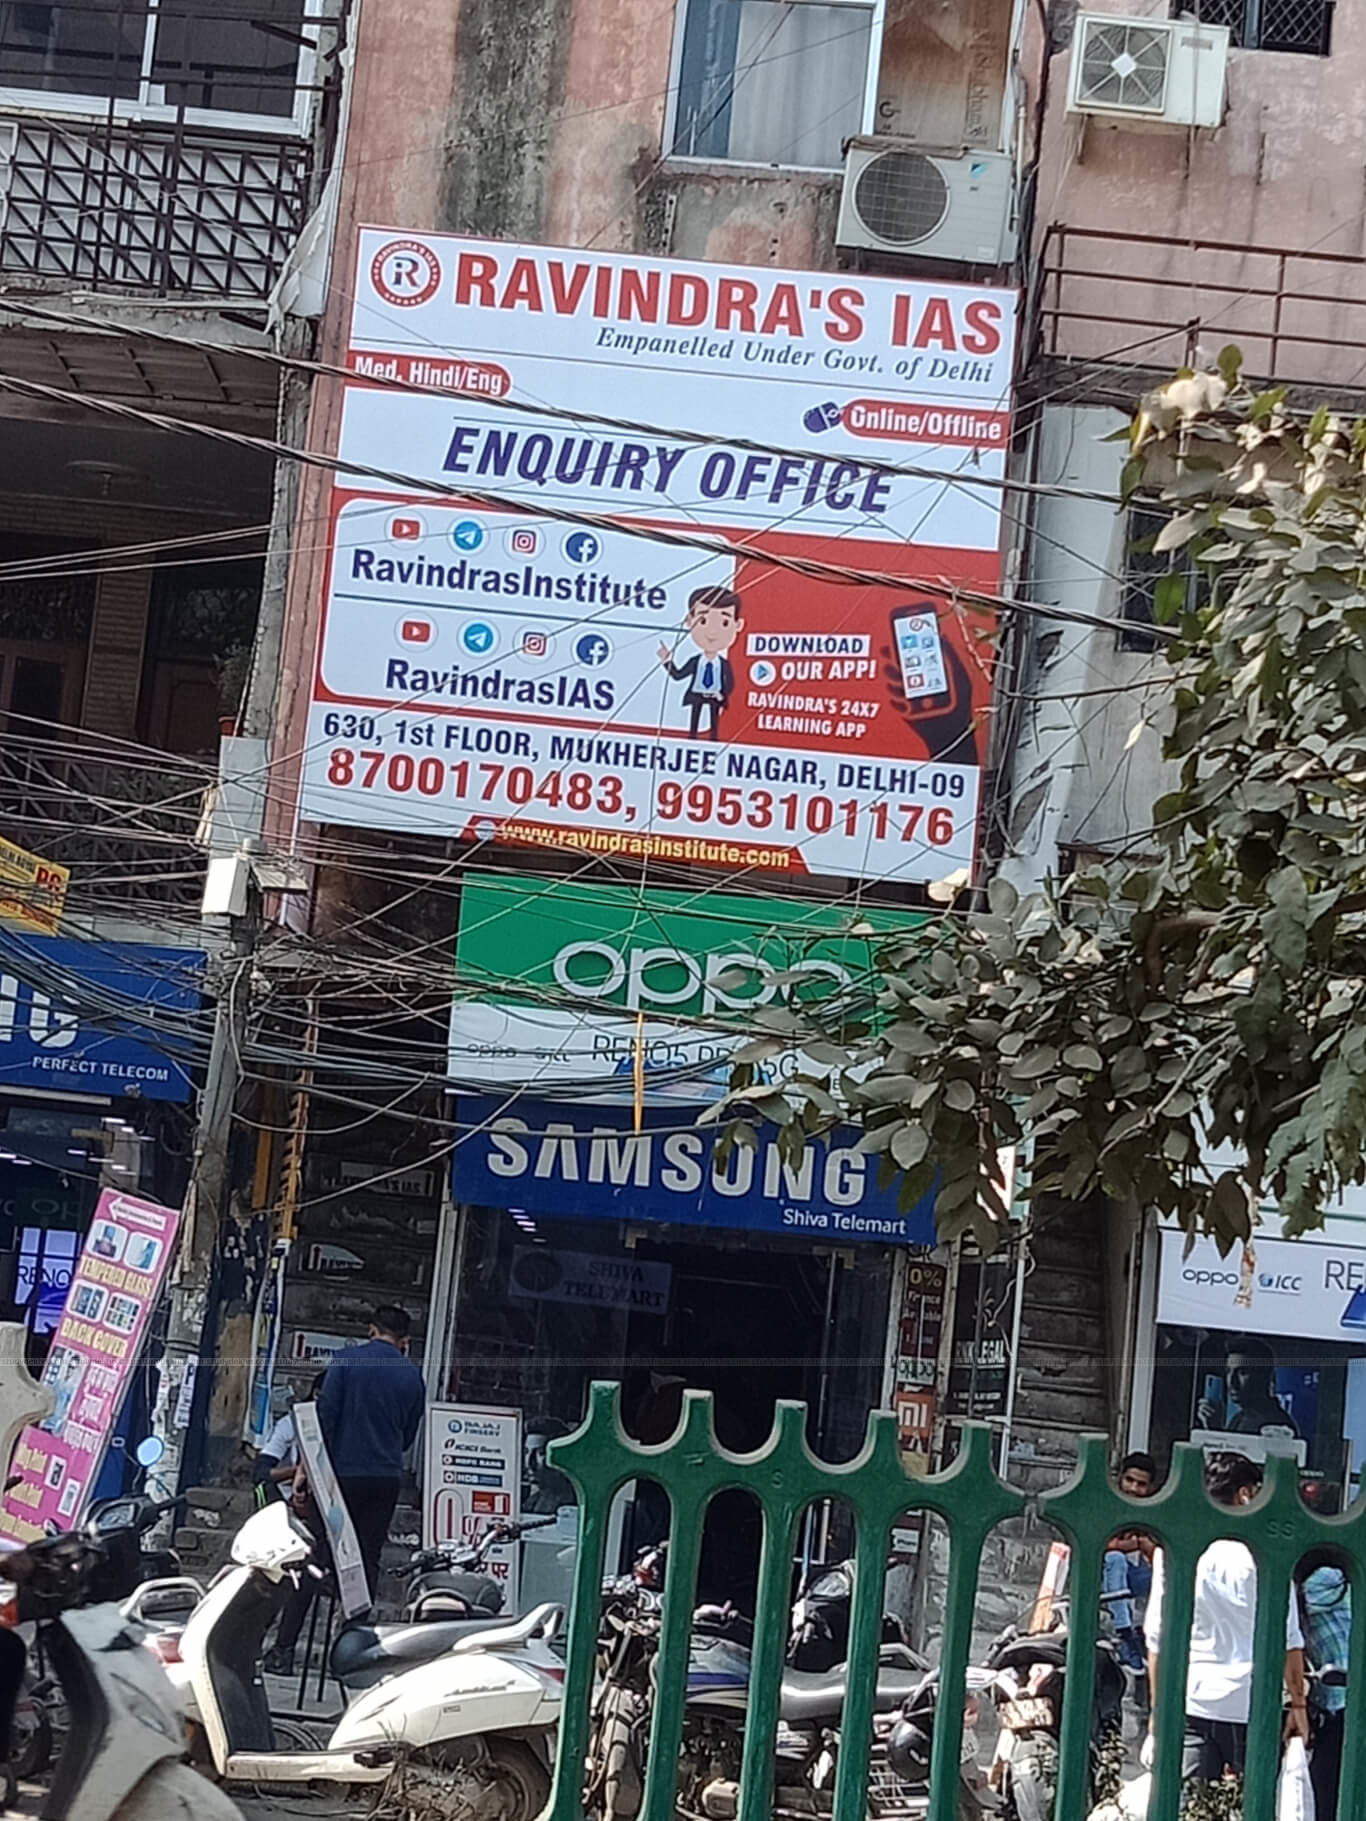 RAVINDRA'S IAS Logo